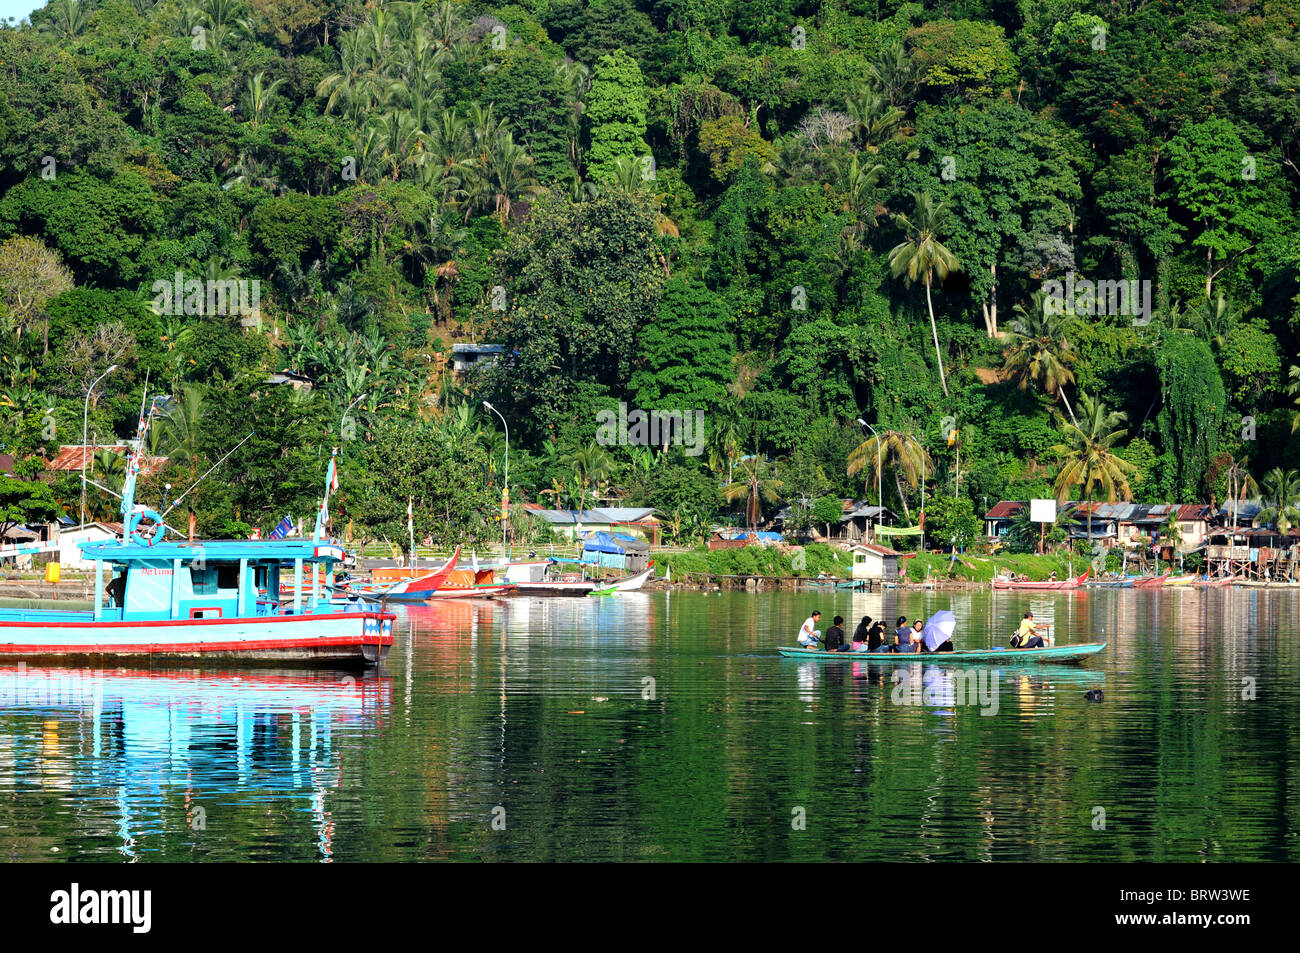 batang arau river padang sumatra indonesia - Stock Image